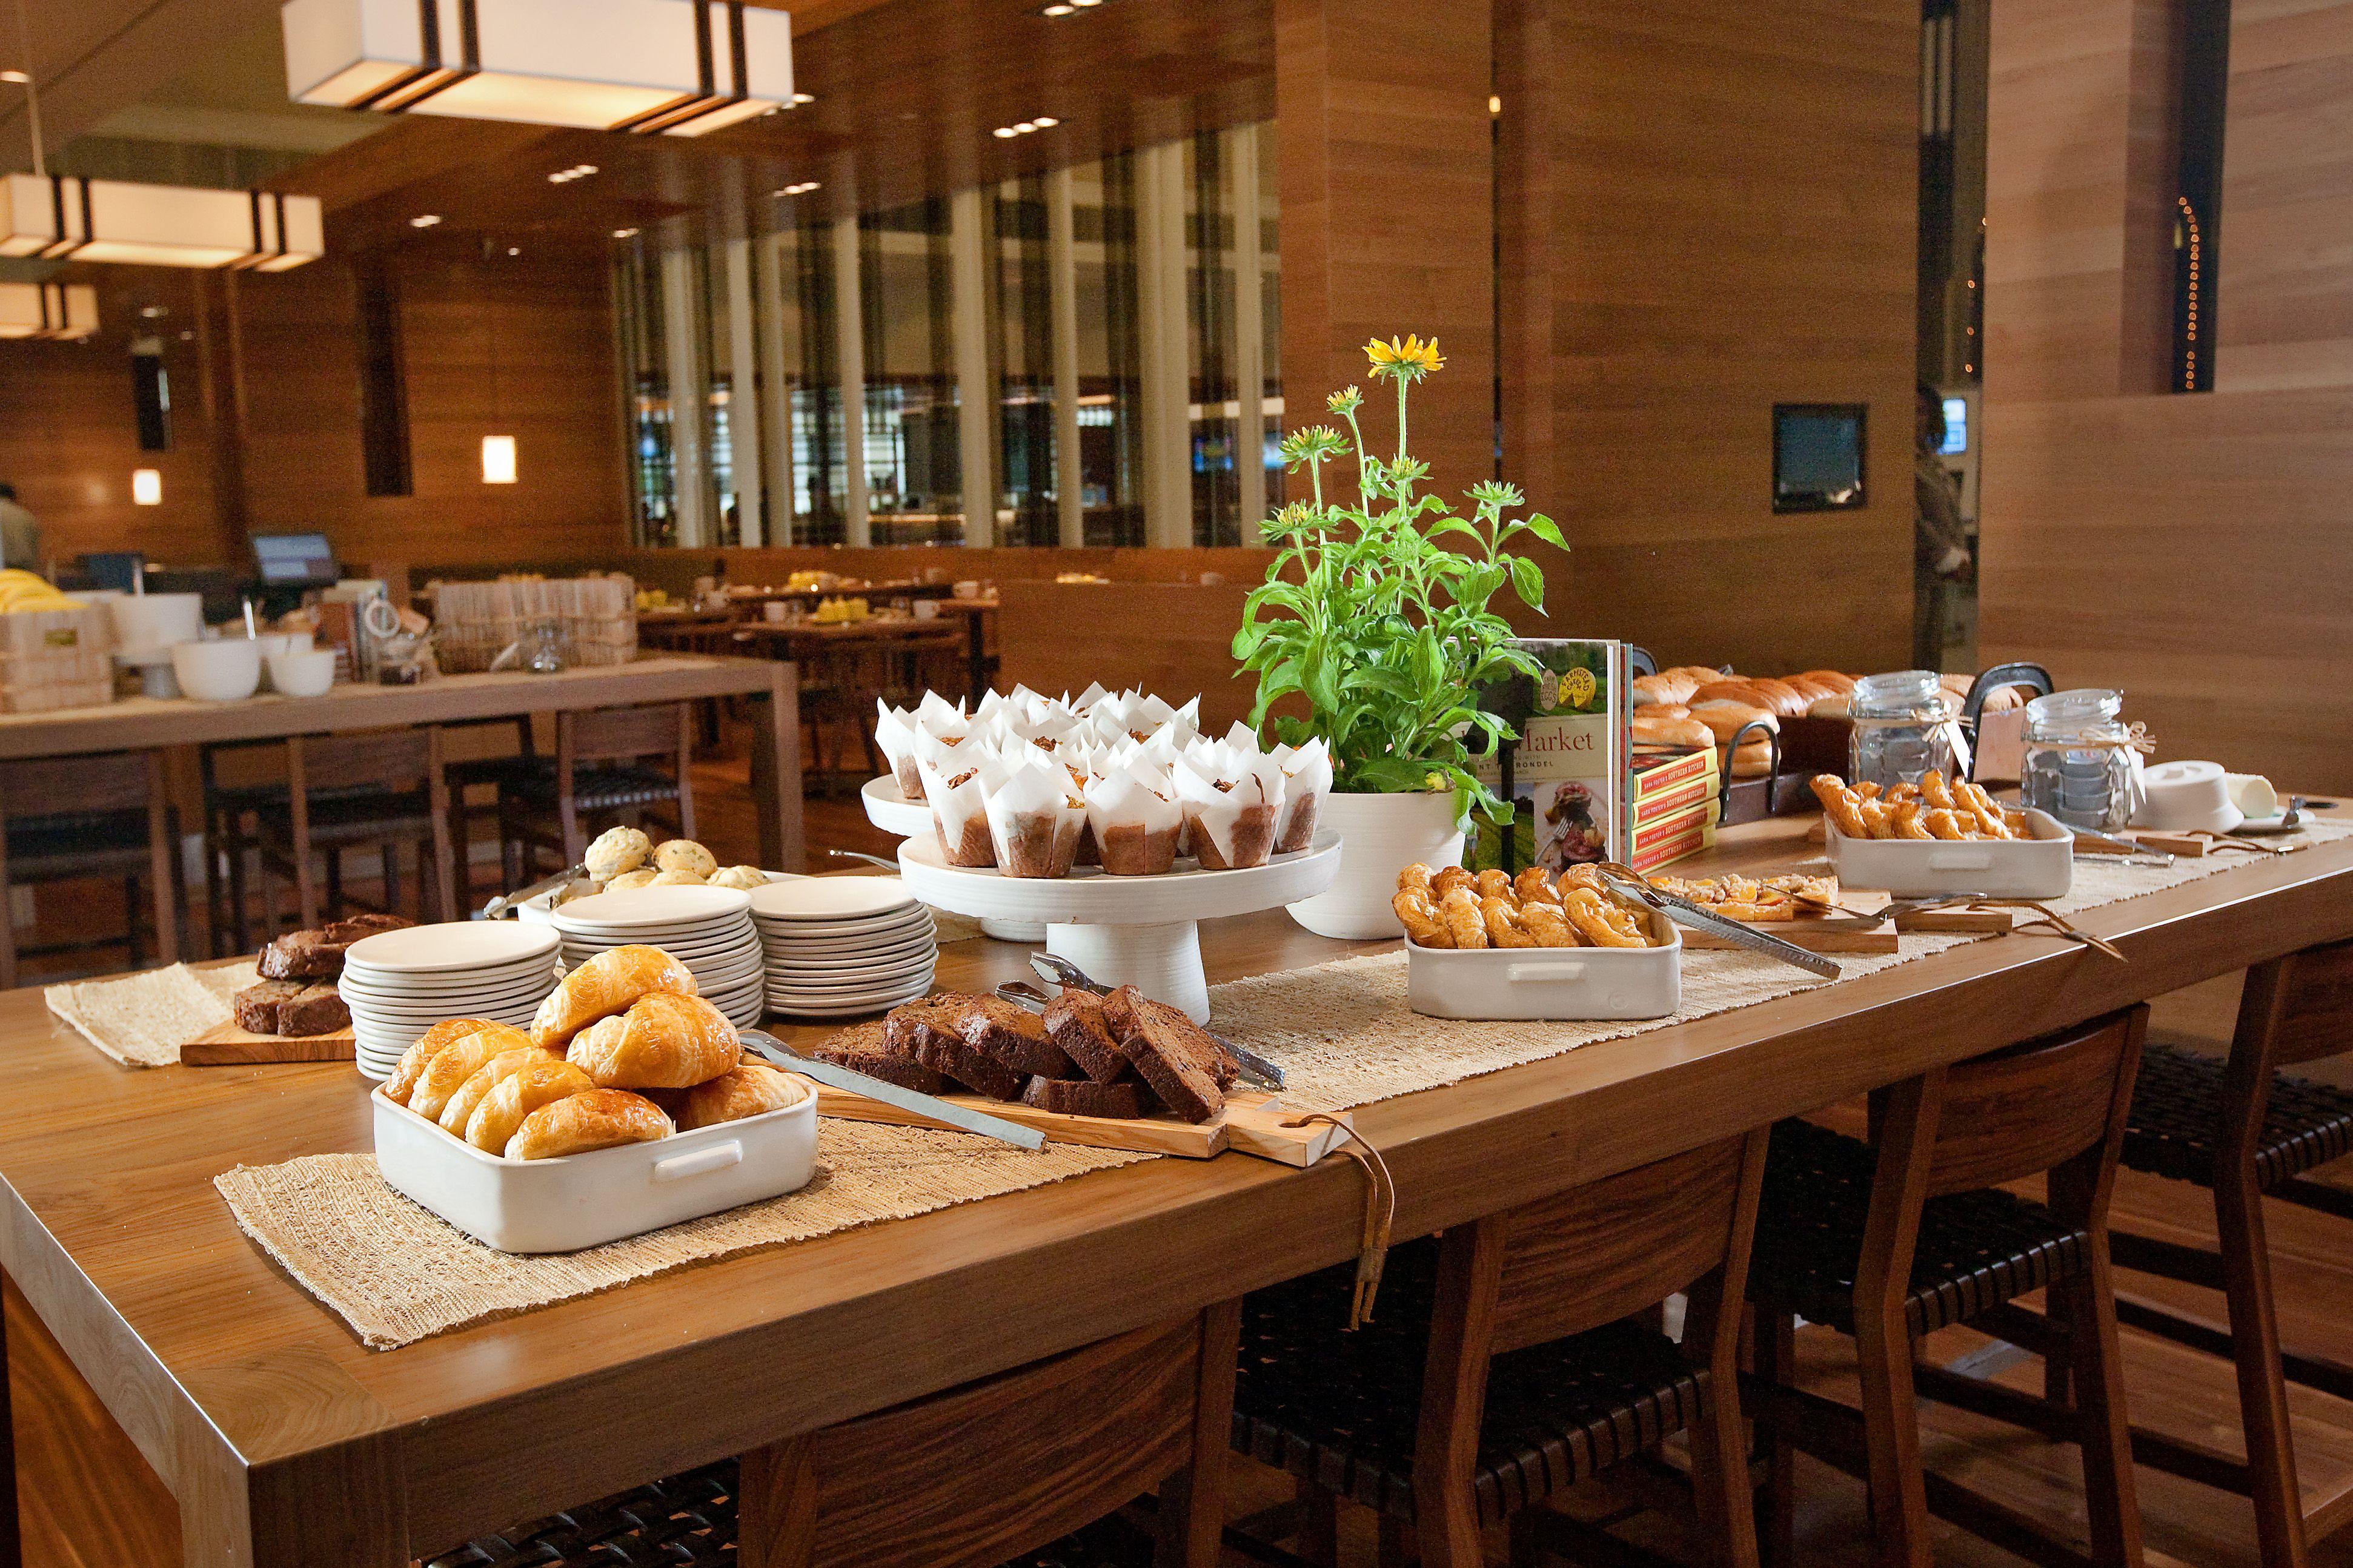 Sway's Pastry Display at Hyatt Regency Atlanta Hotel